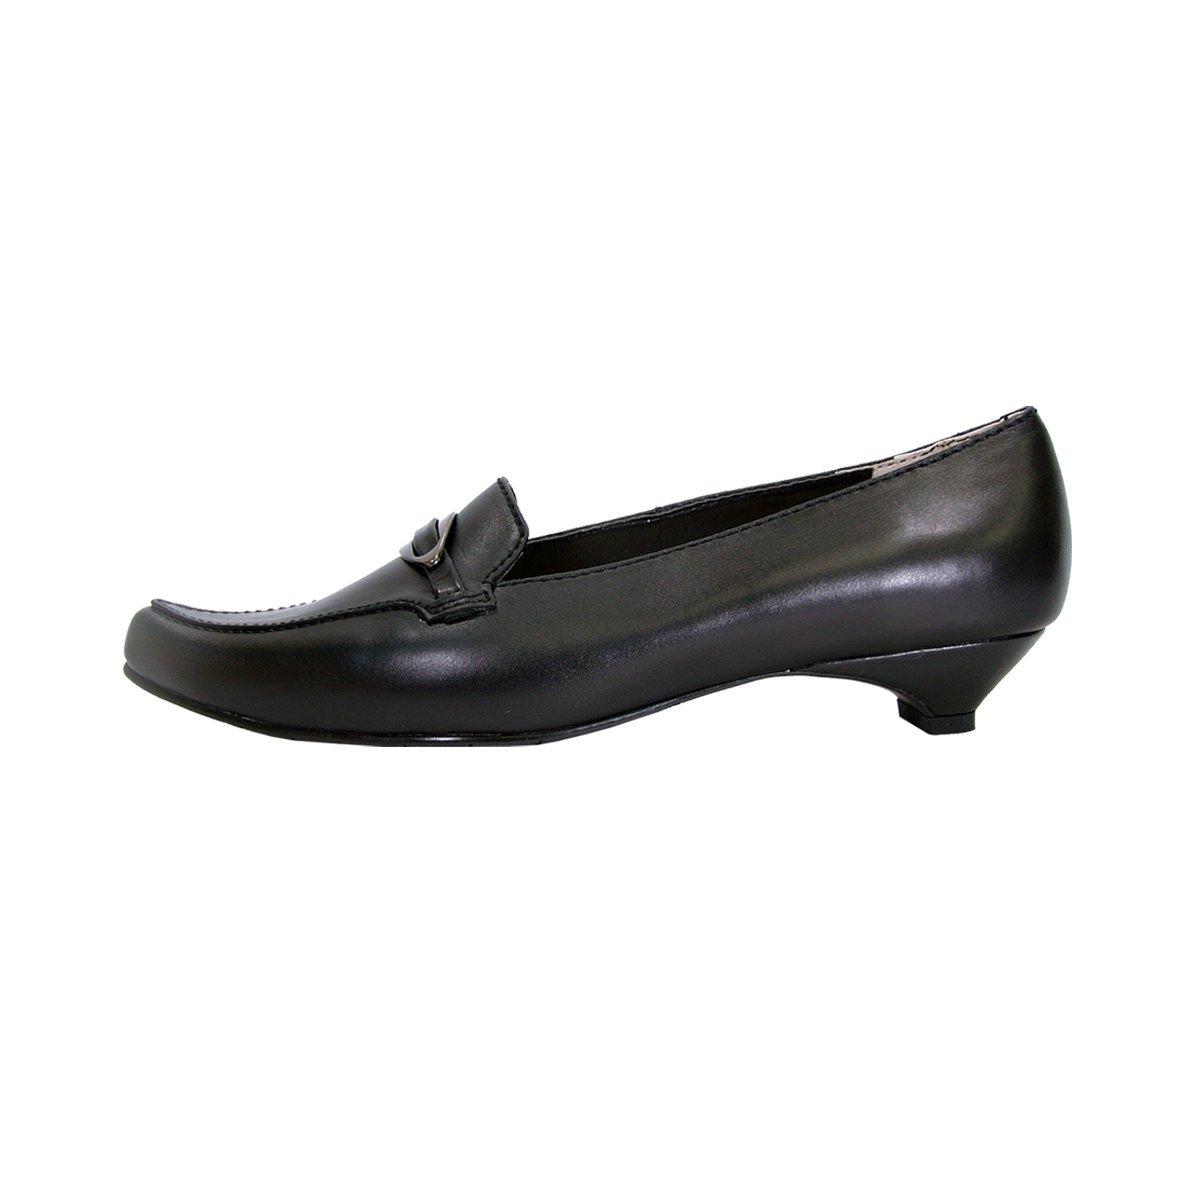 Peerage Louise Women Wide Width Smart Casual Leather Flat (Size/Measurement) Pumps with Kitten Heels (Size/Measurement) Flat B079TC4K2M 6.5 E|Black 4f6b2e